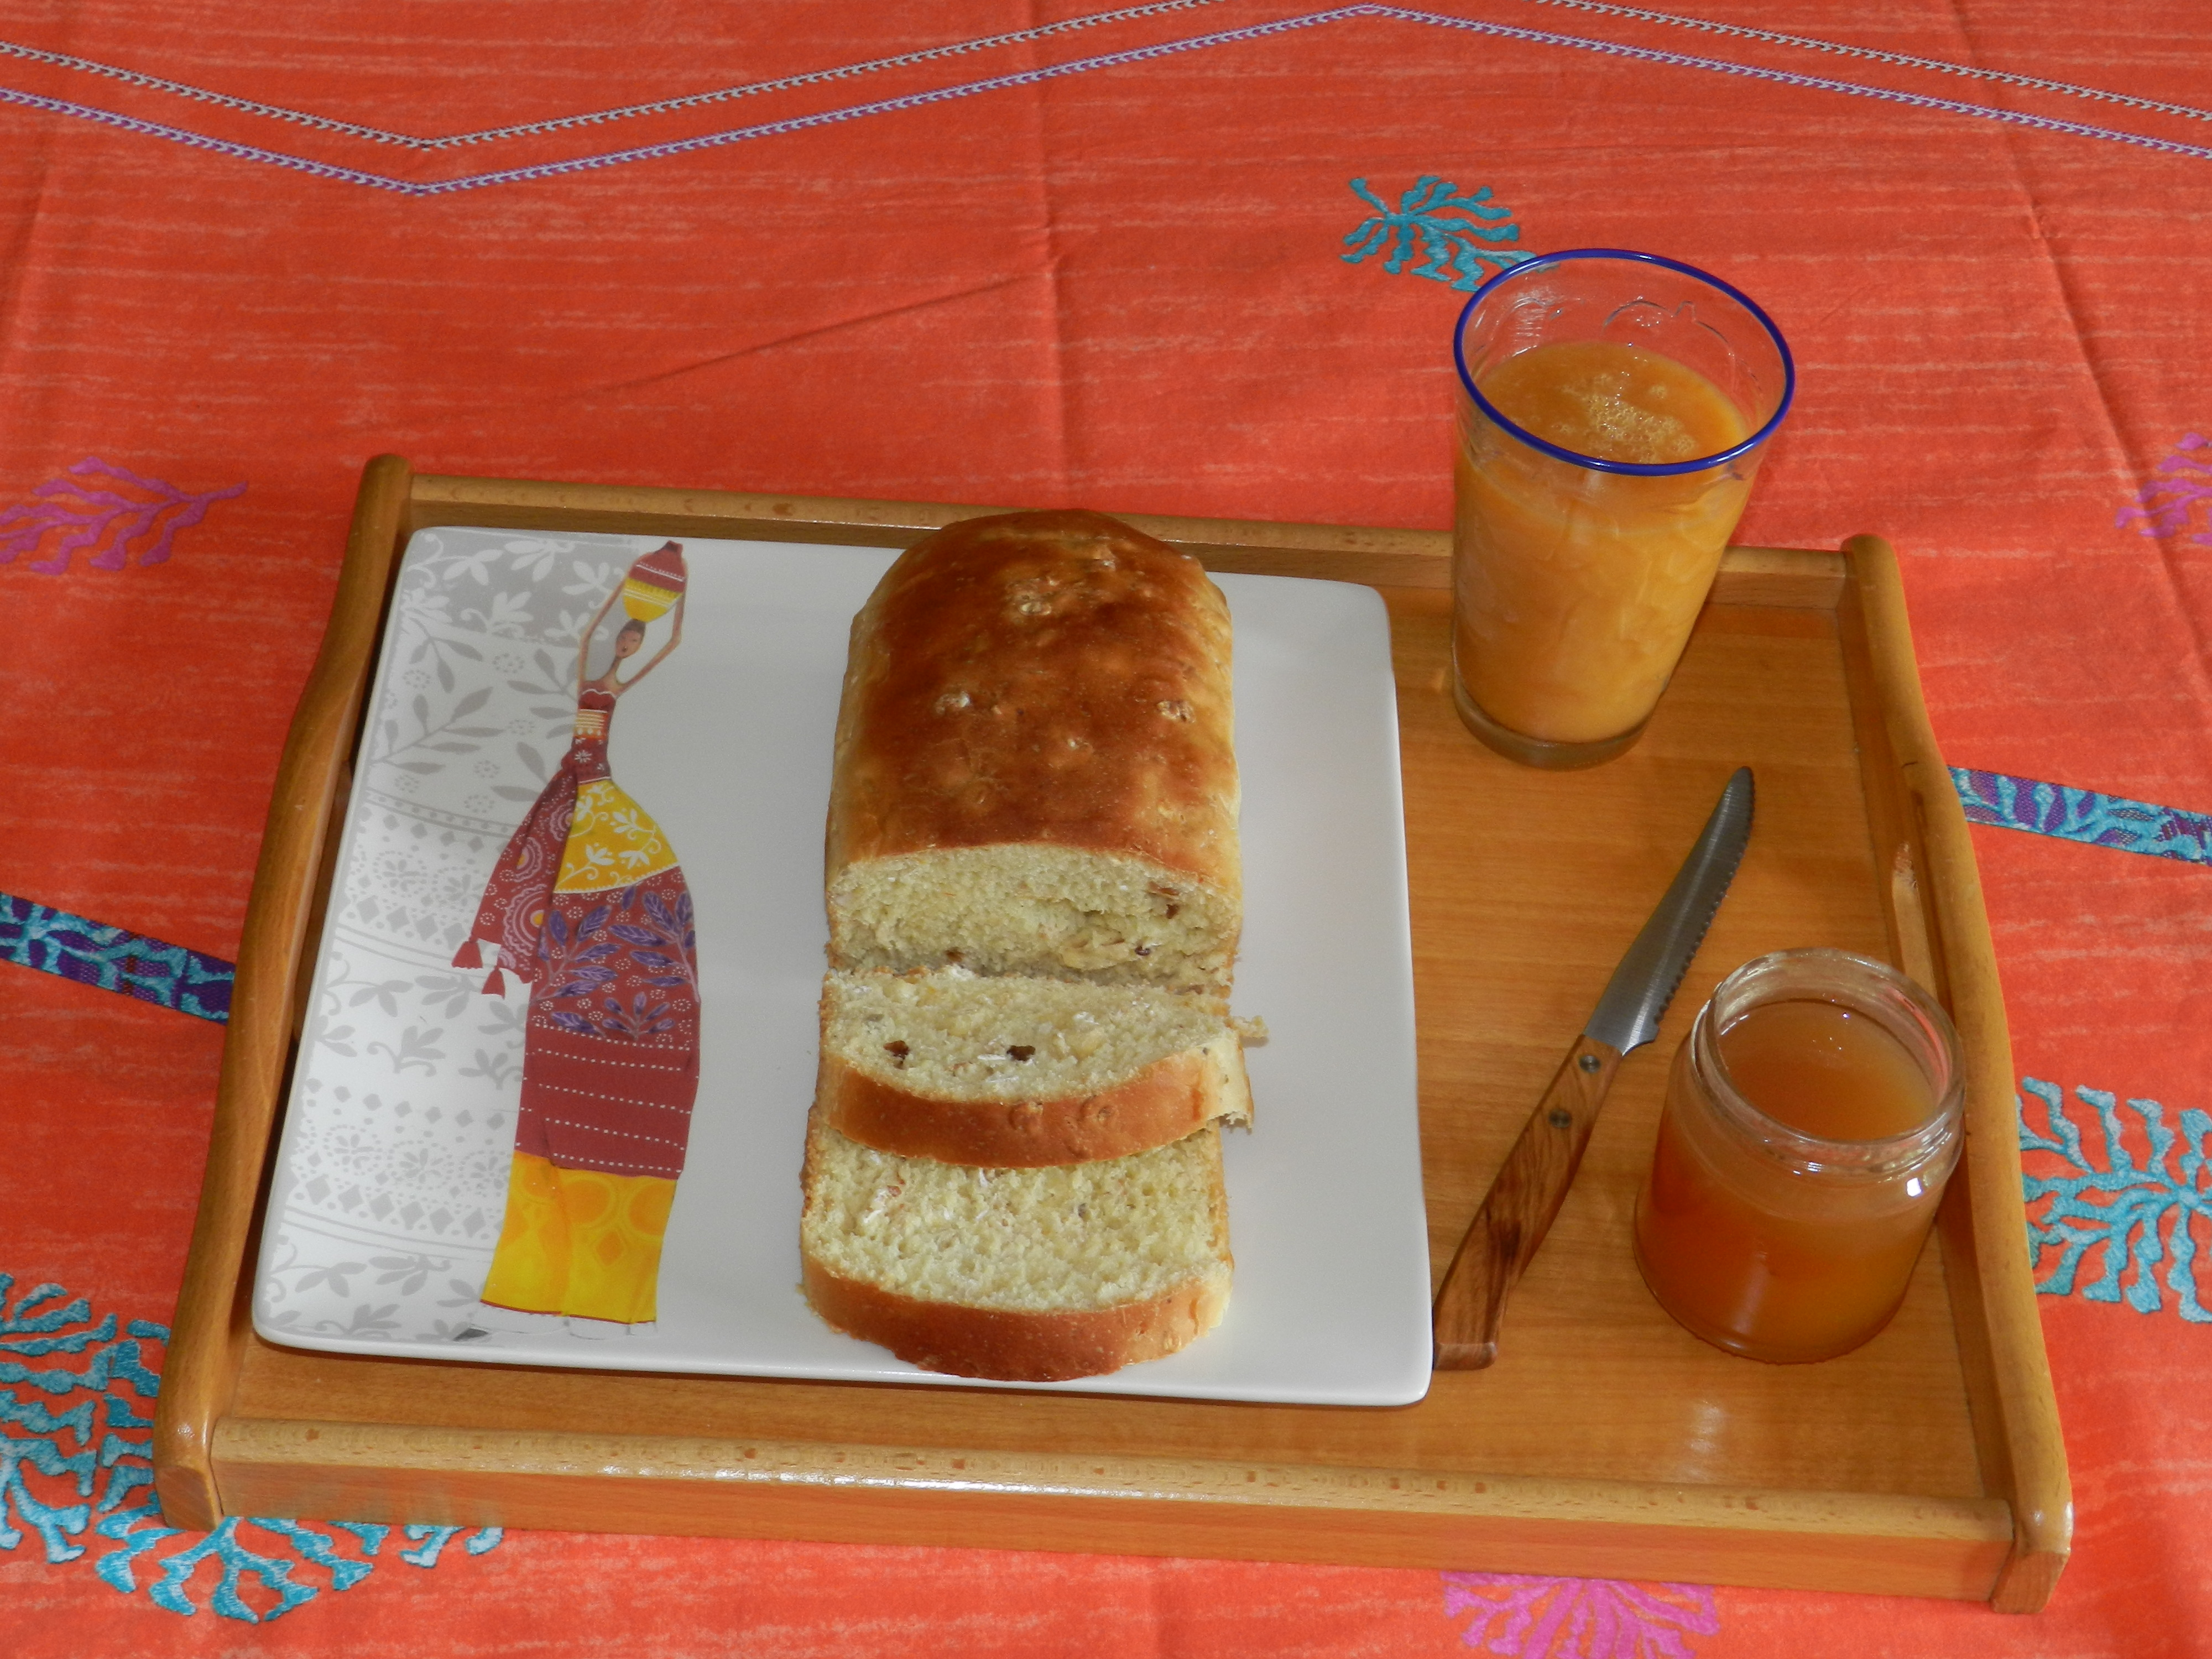 pane dolce al miele e muesli